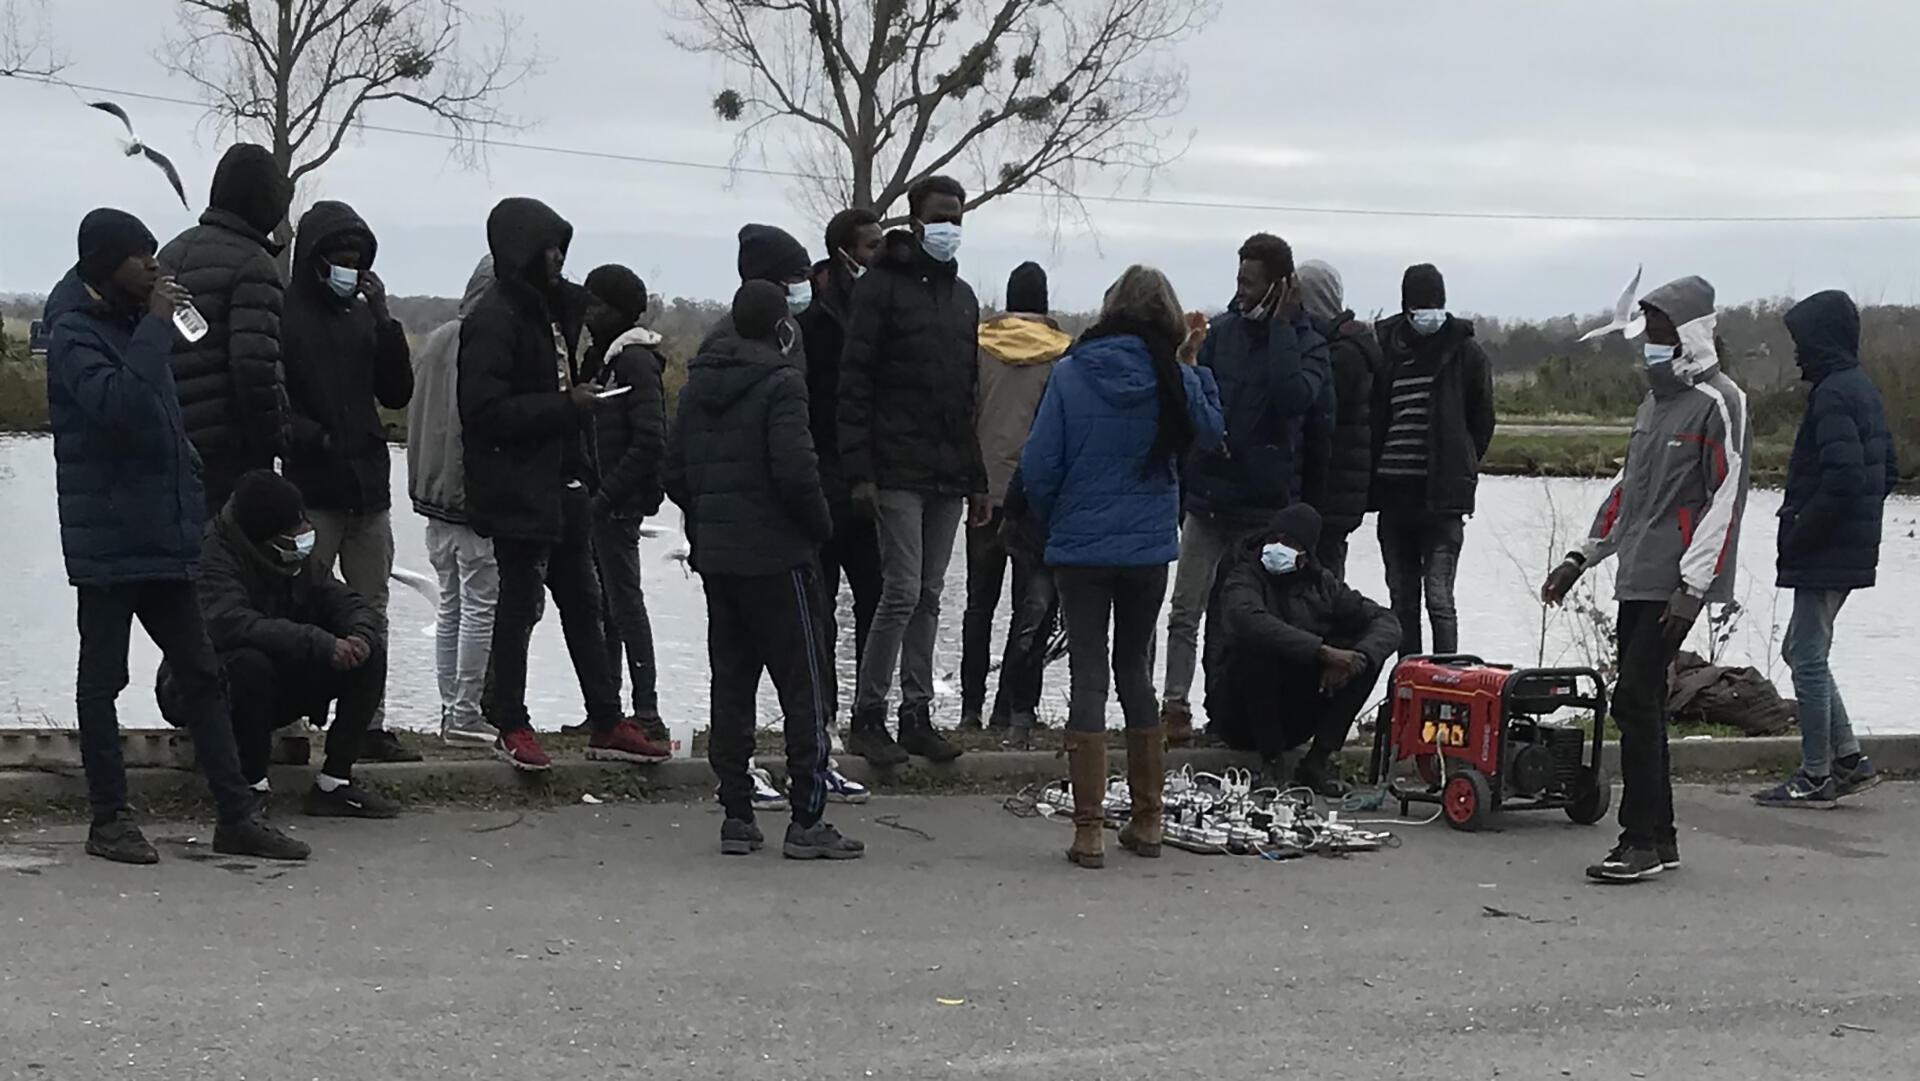 France - migrants soudanais - Ouistreham - Grand reportage - Martin Guez